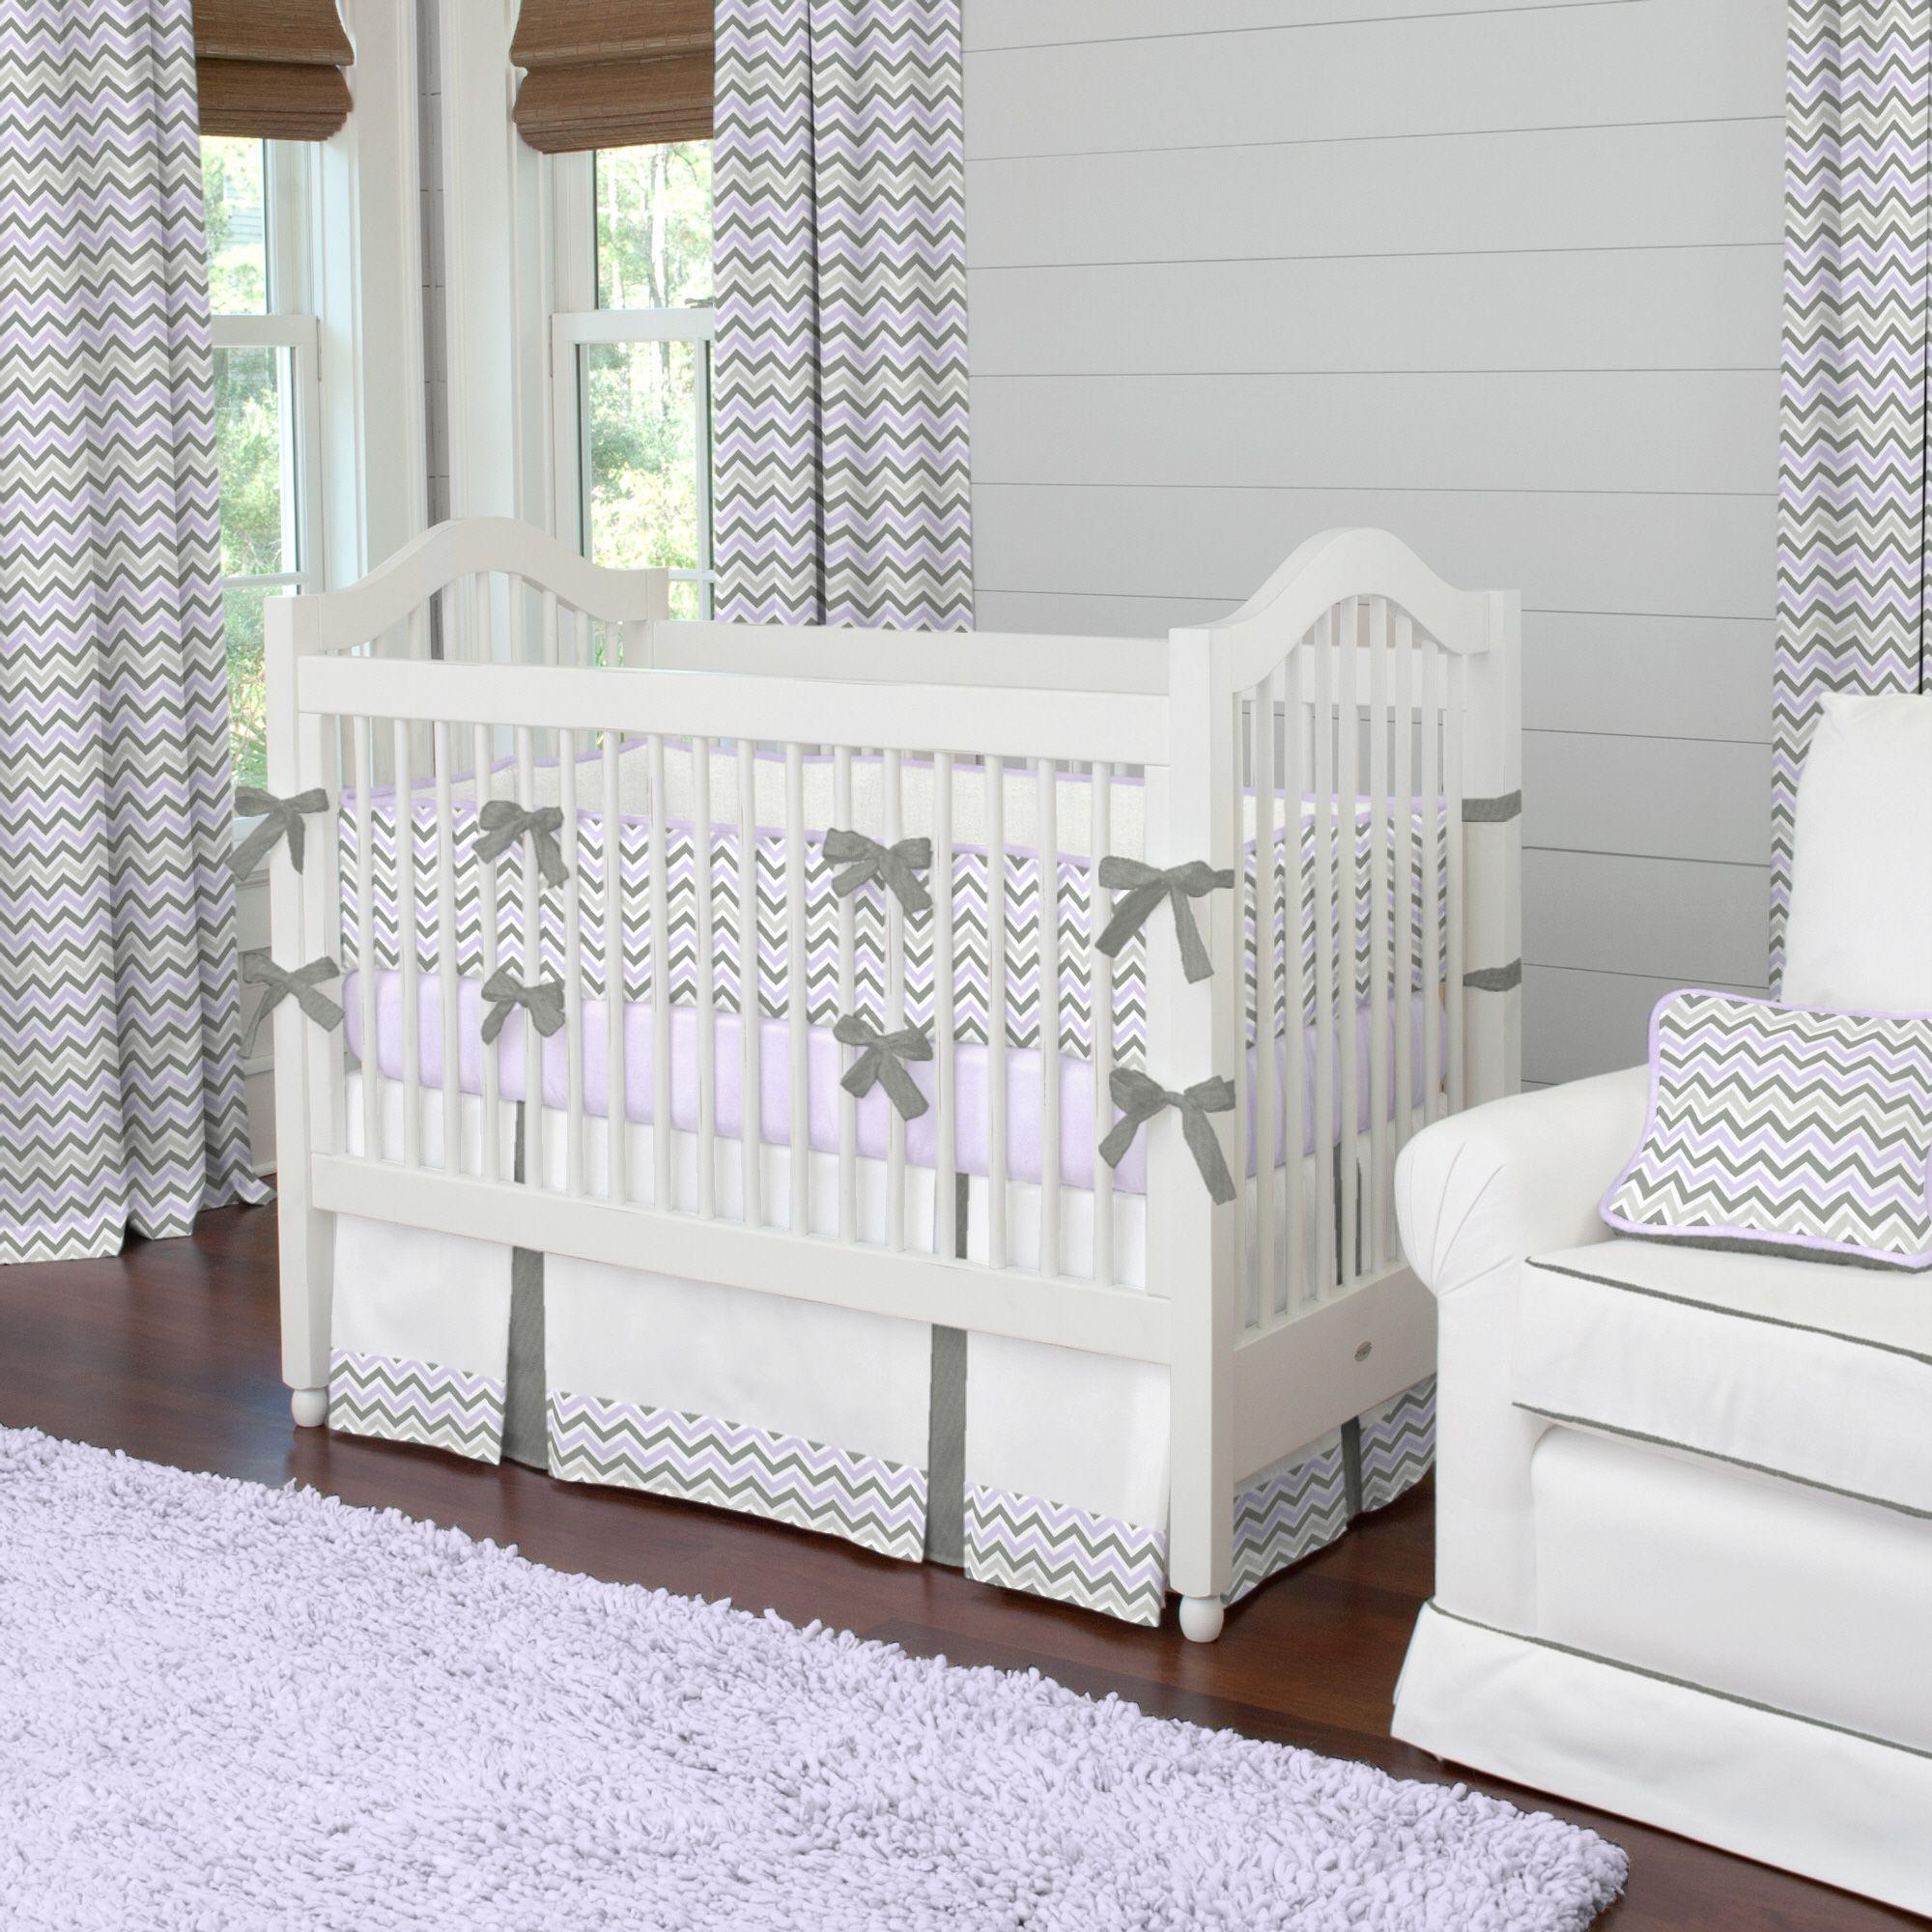 Lilac And Slate Gray Chevron Crib Bedding Baby For Carouseldesigns